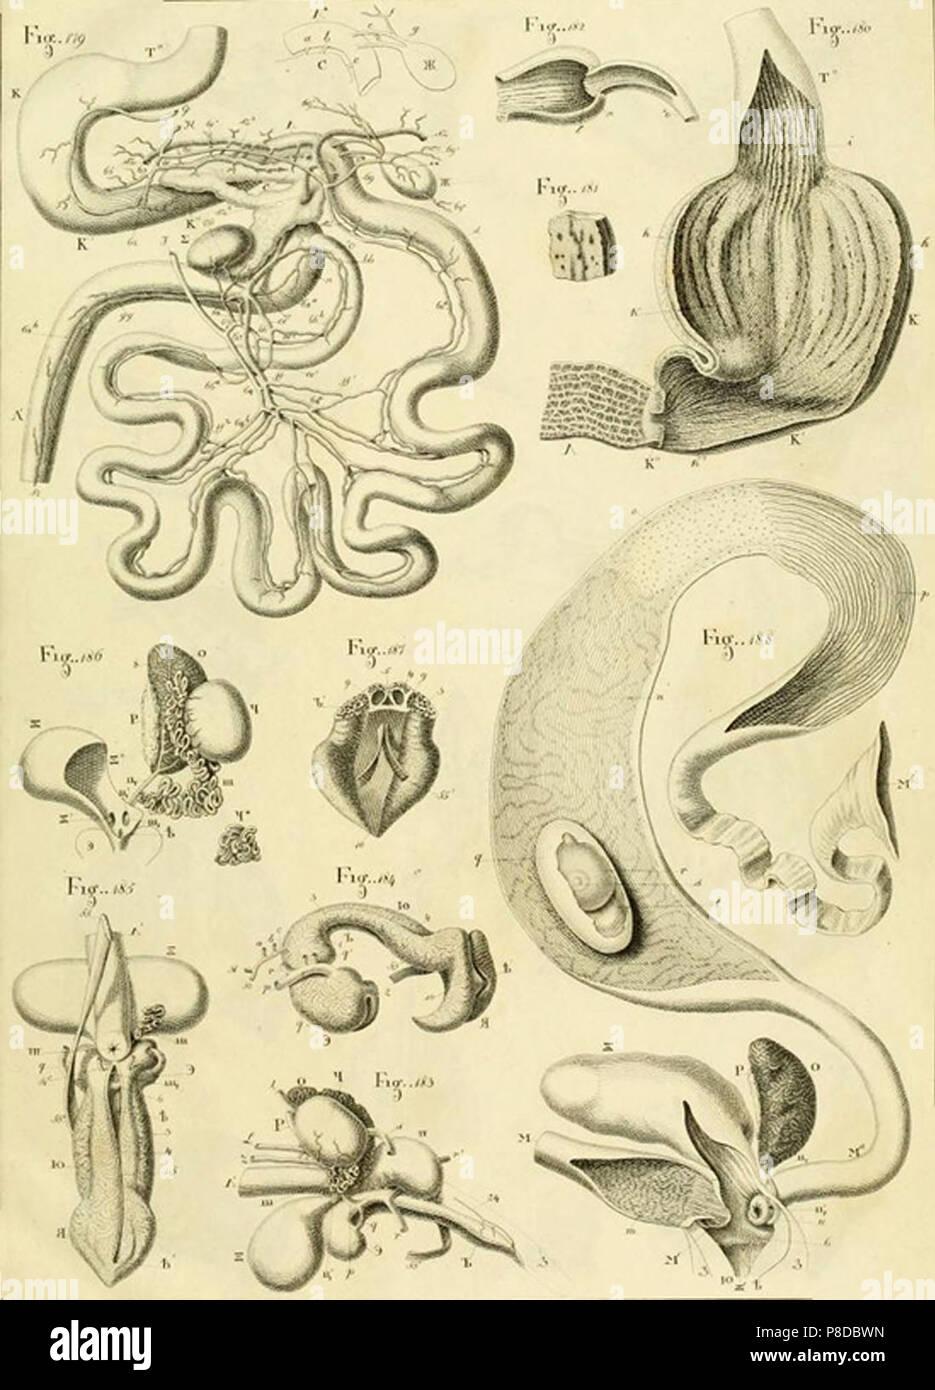 turtle anatomy Stock Photo: 211736385 - Alamy